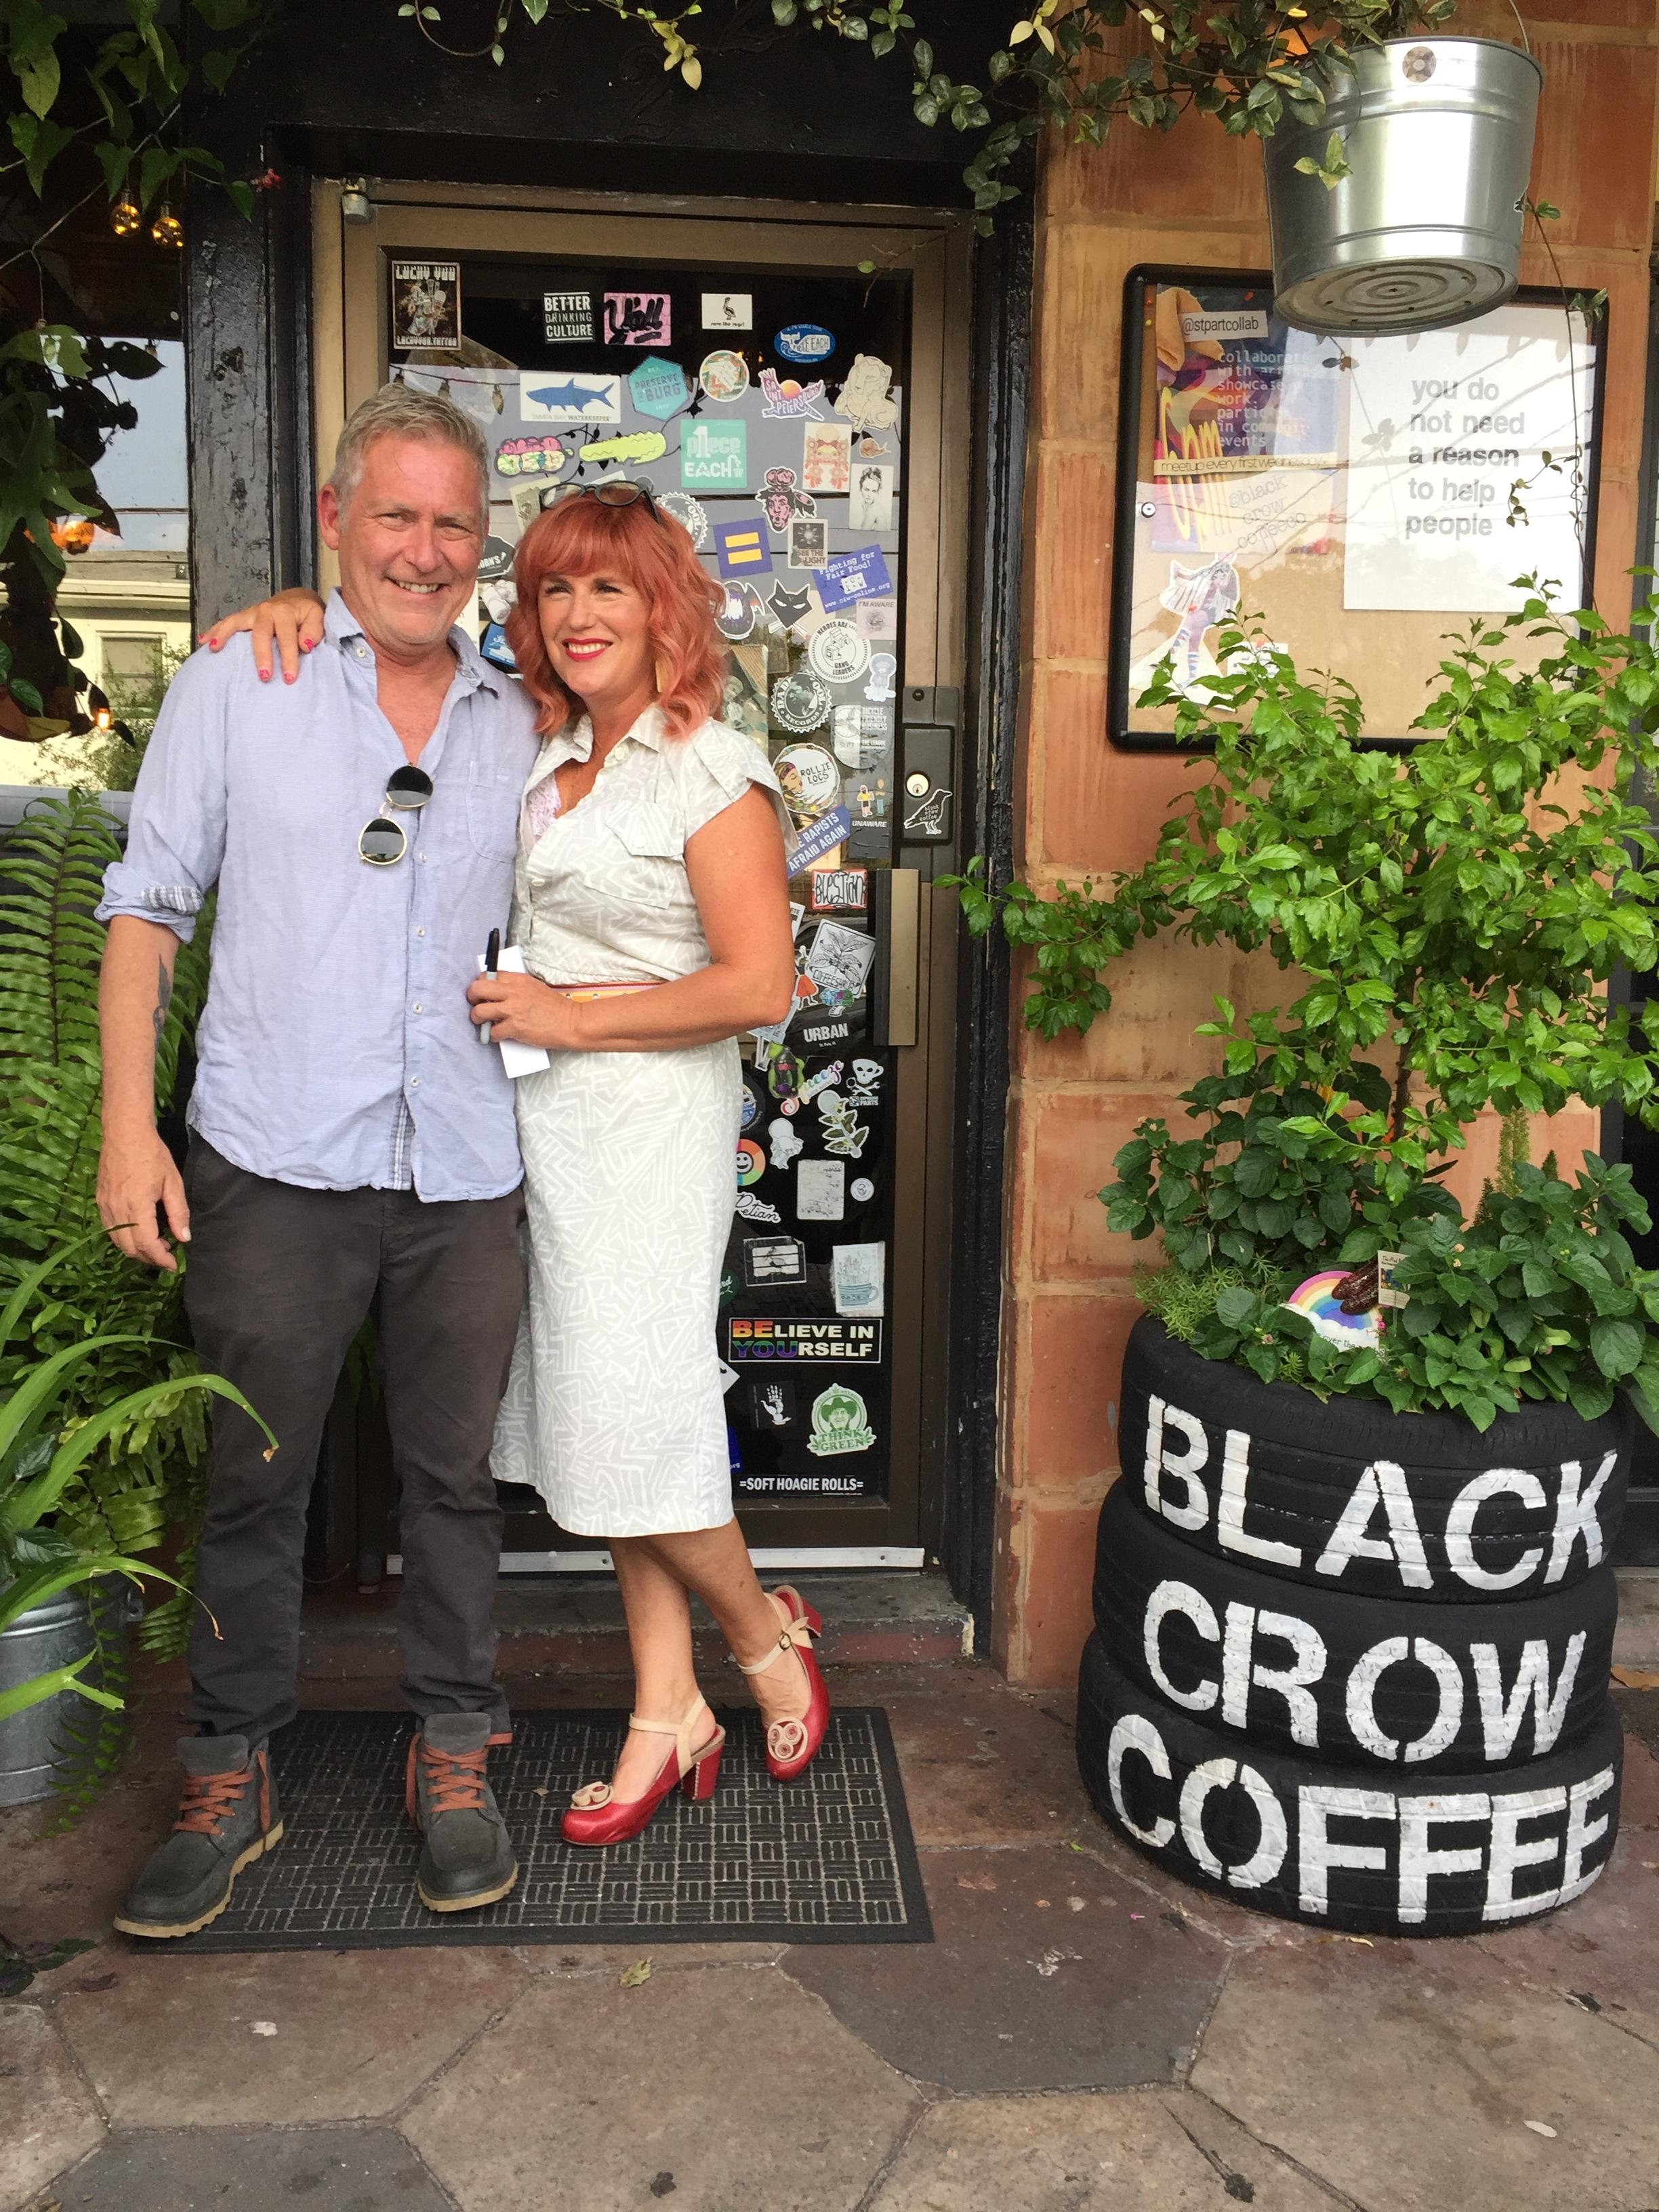 Black Crow Coffee Co. owners Greg Bauman and Deana Hawk.